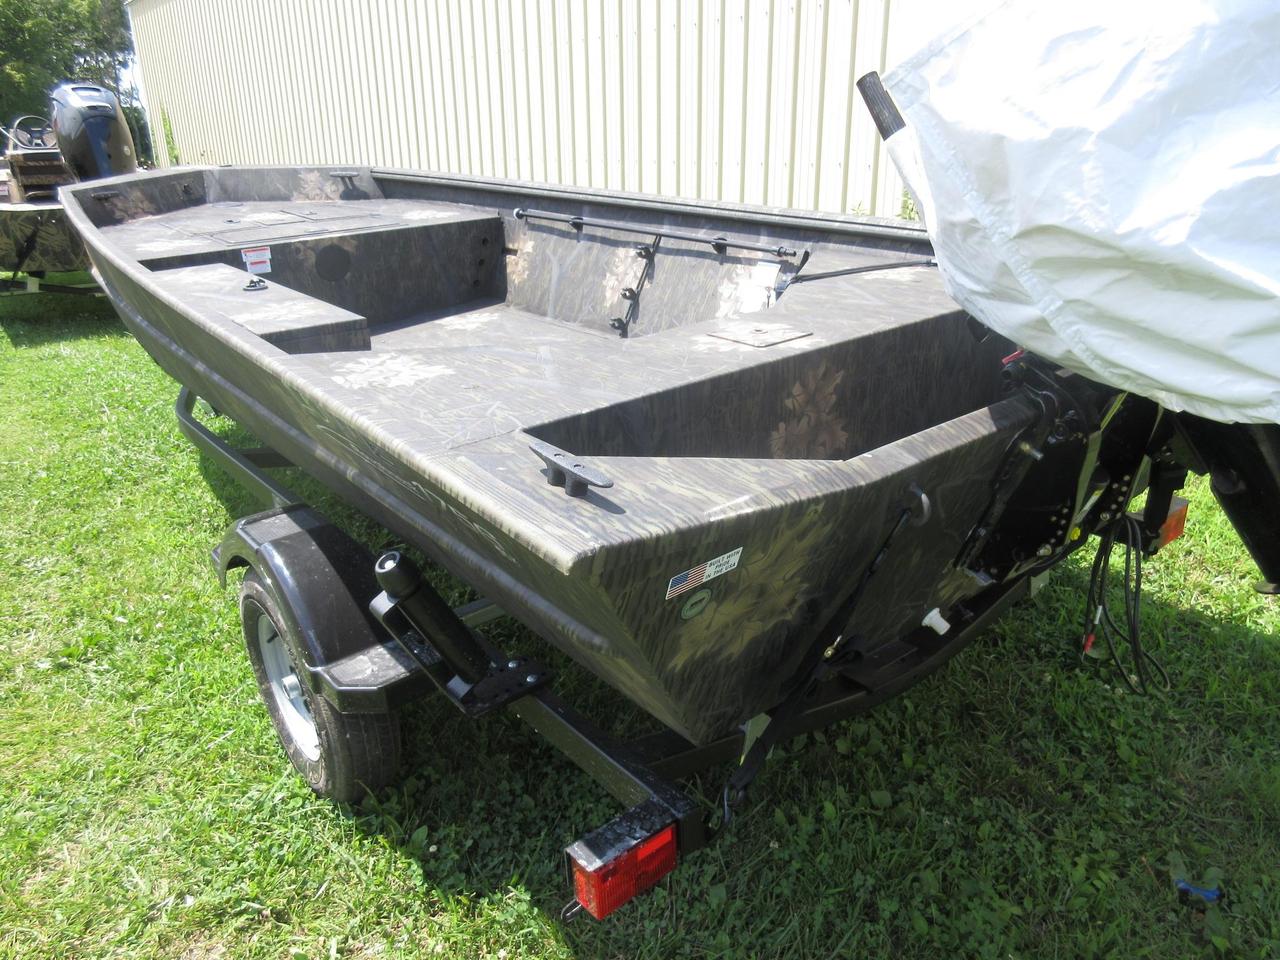 2017 New Lowe Roughneck 1756 Deluxe Tiller Aluminum Fishing Boat For Sale - $14,249 - Rockville ...